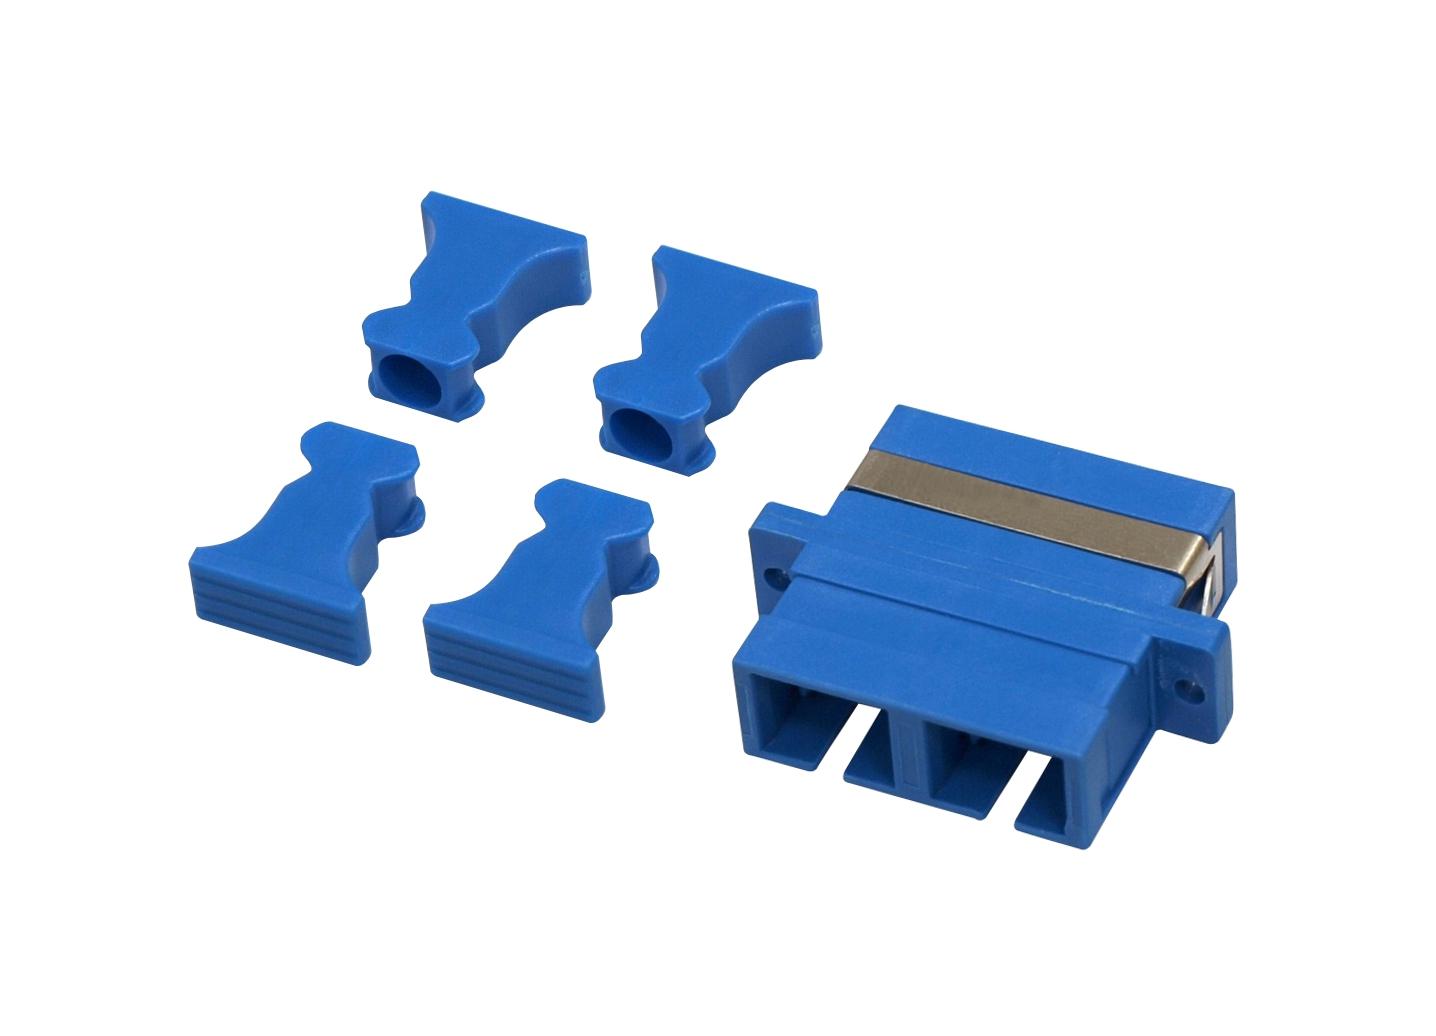 1 Stk LWL Kupplung SC-Duplex,Kunststoff,Singlemode,zirc,Flansch,bl HMOL000054